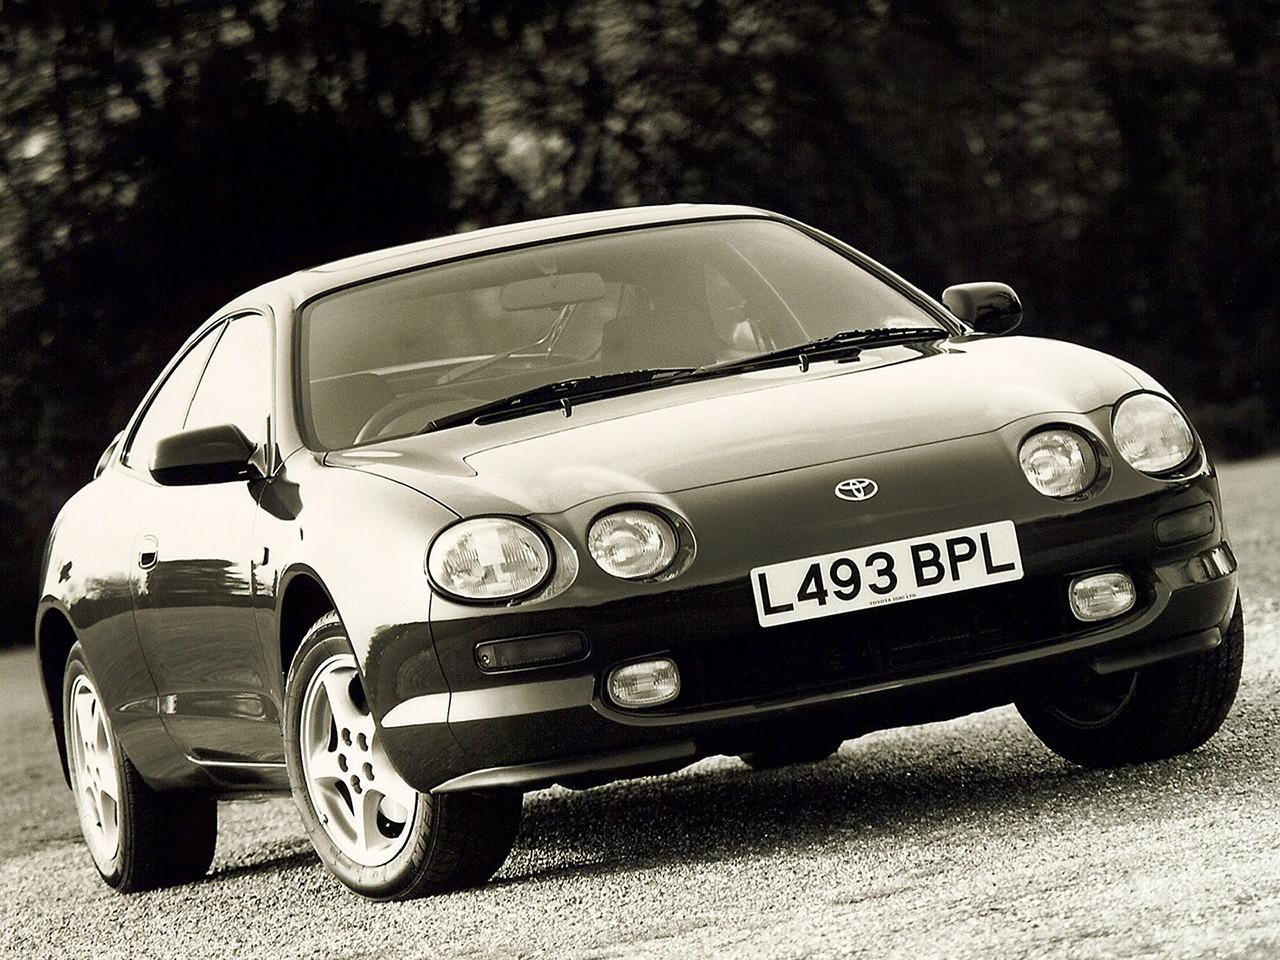 Toyota Tacoma 1999 >> TOYOTA Celica specs & photos - 1994, 1995, 1996, 1997, 1998, 1999 - autoevolution